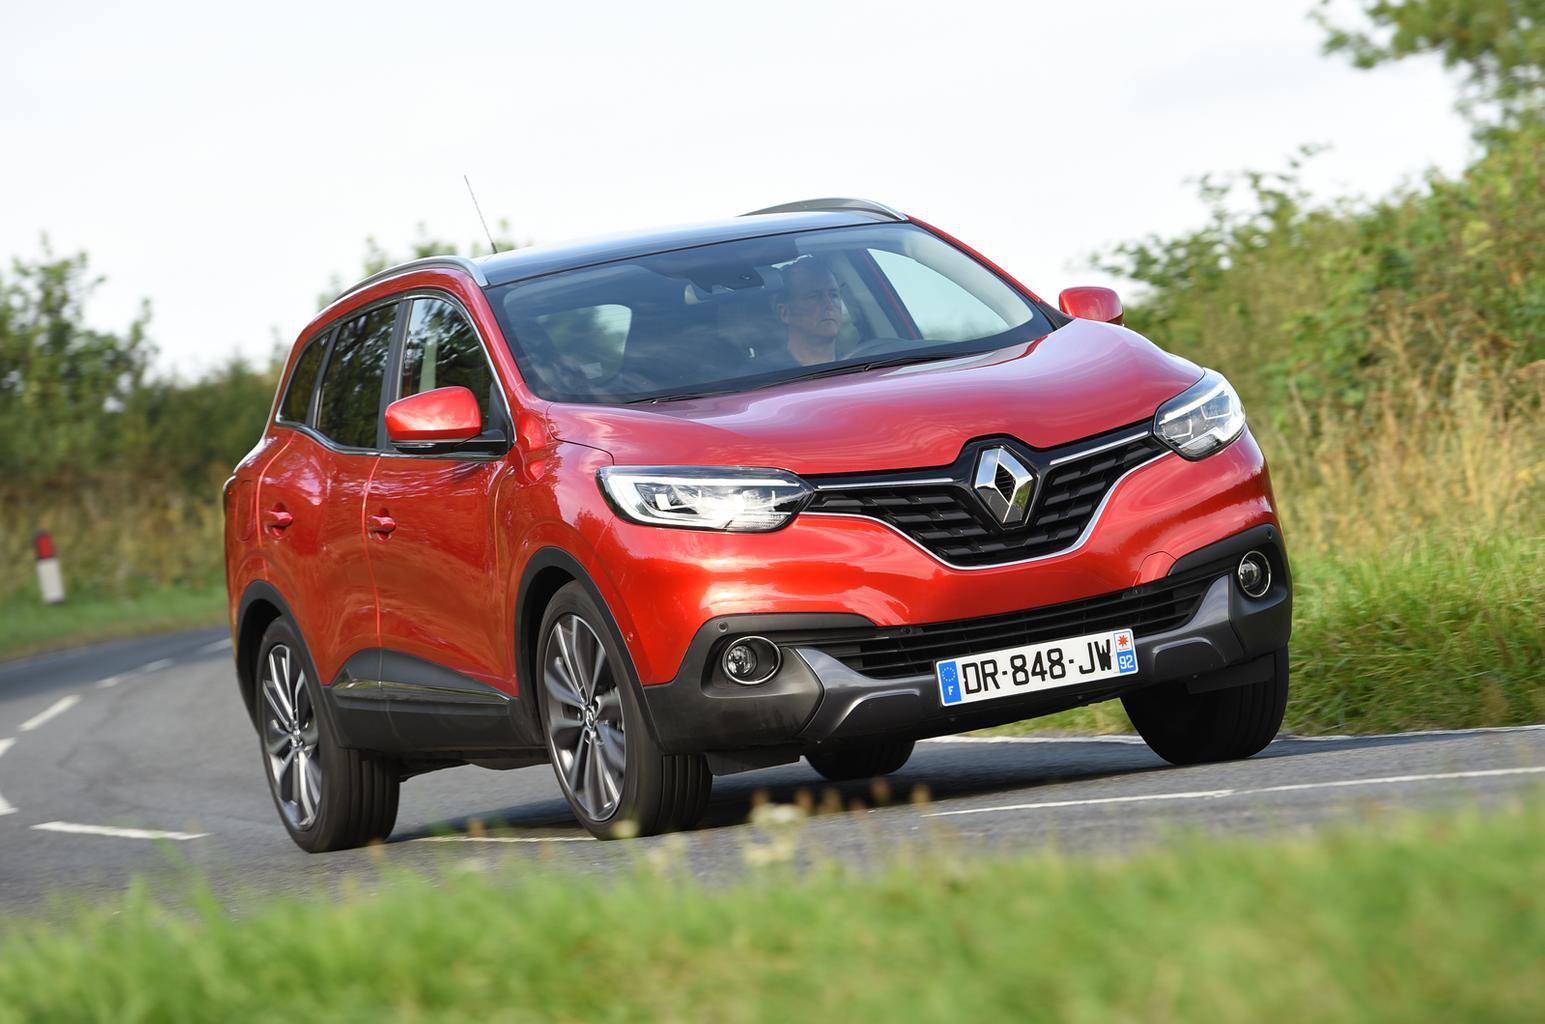 2015 Renault Kadjar UK review